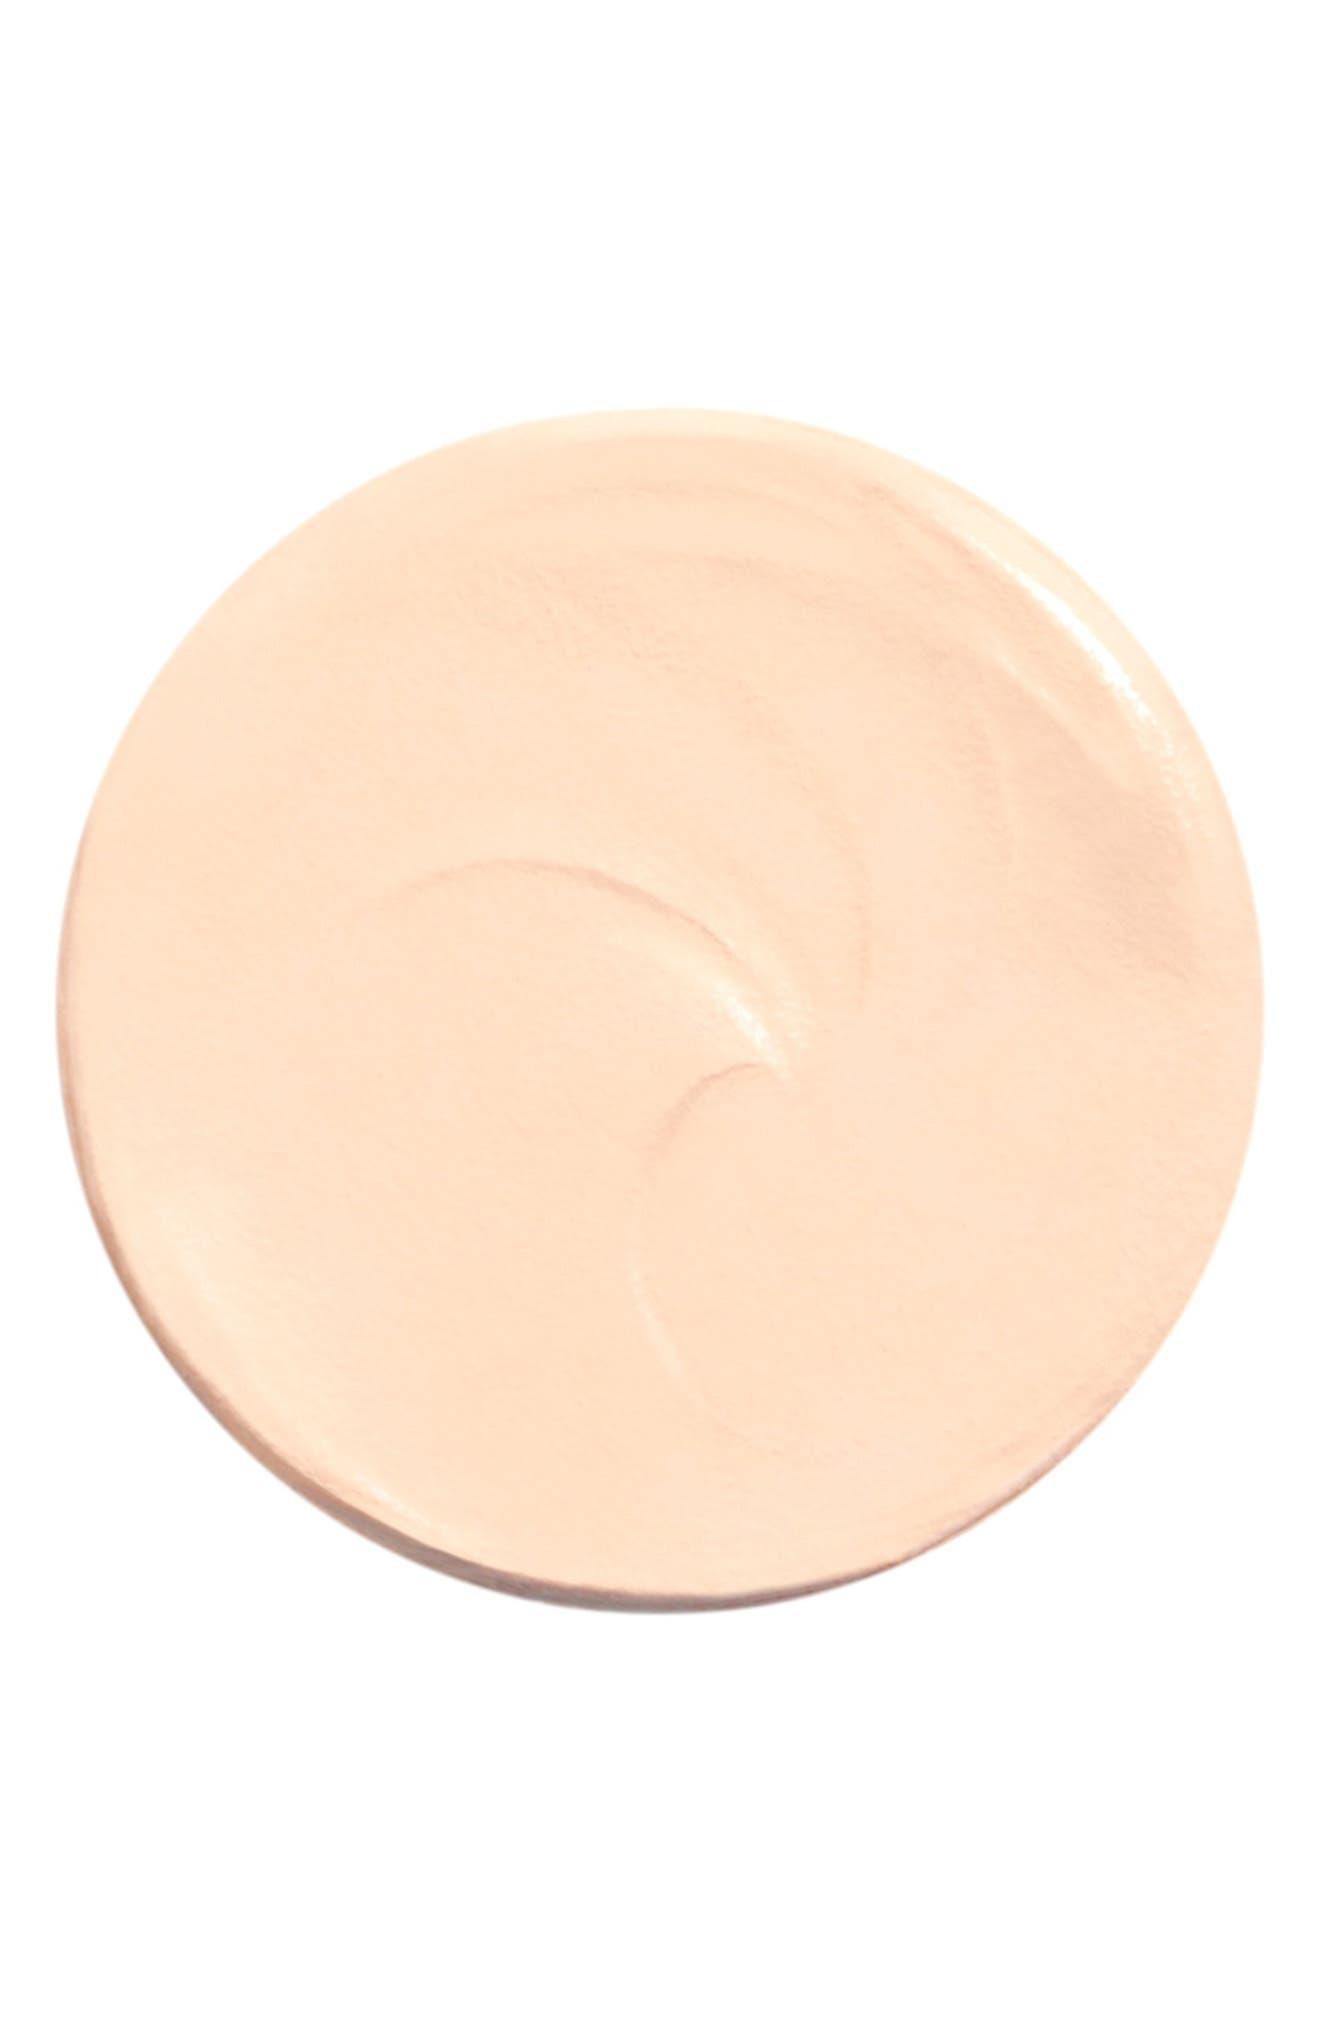 Soft Matte Concealer,                             Alternate thumbnail 4, color,                             CHANTILLY